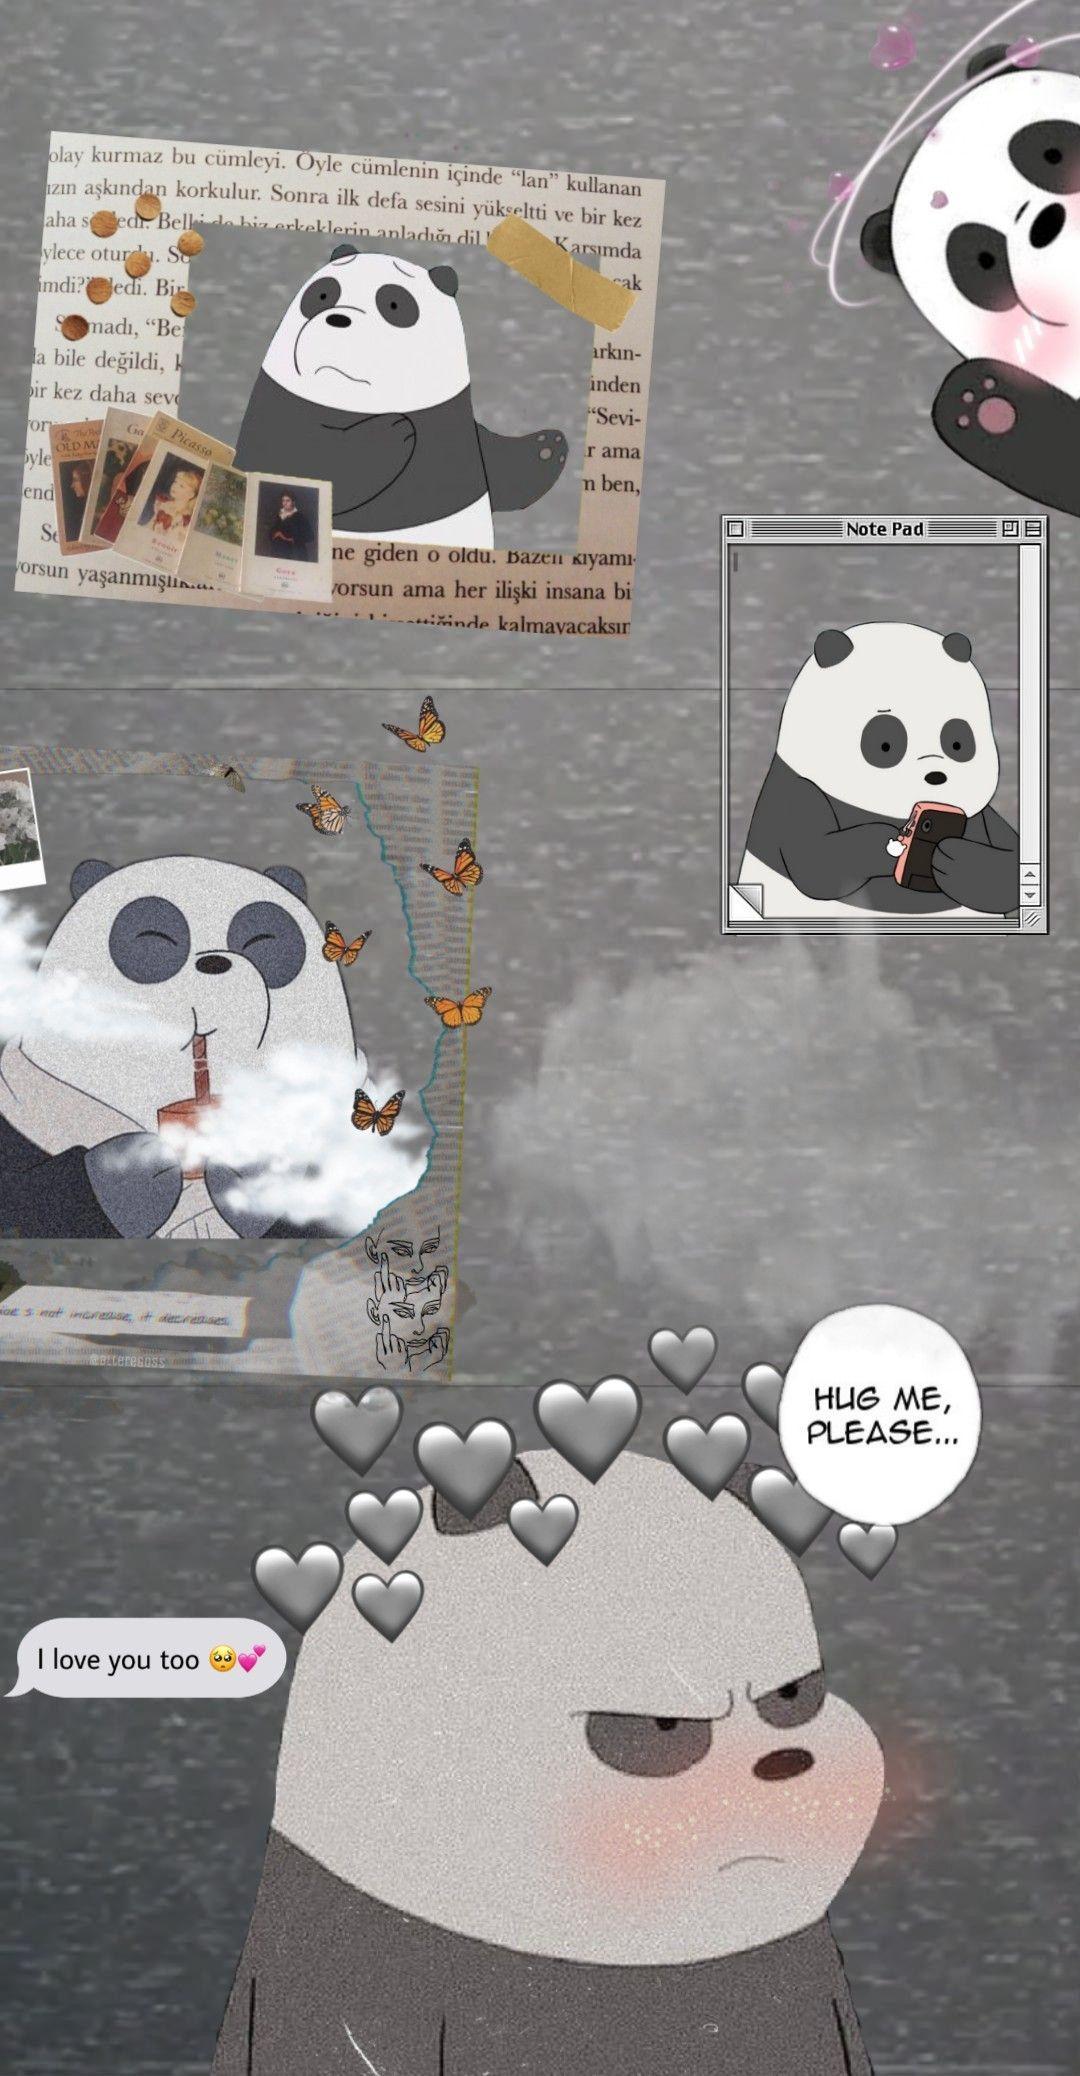 Webarebears Panda Aesthetic Wallpaper Kartu Lucu Ilustrasi Poster Ilustrasi Buku